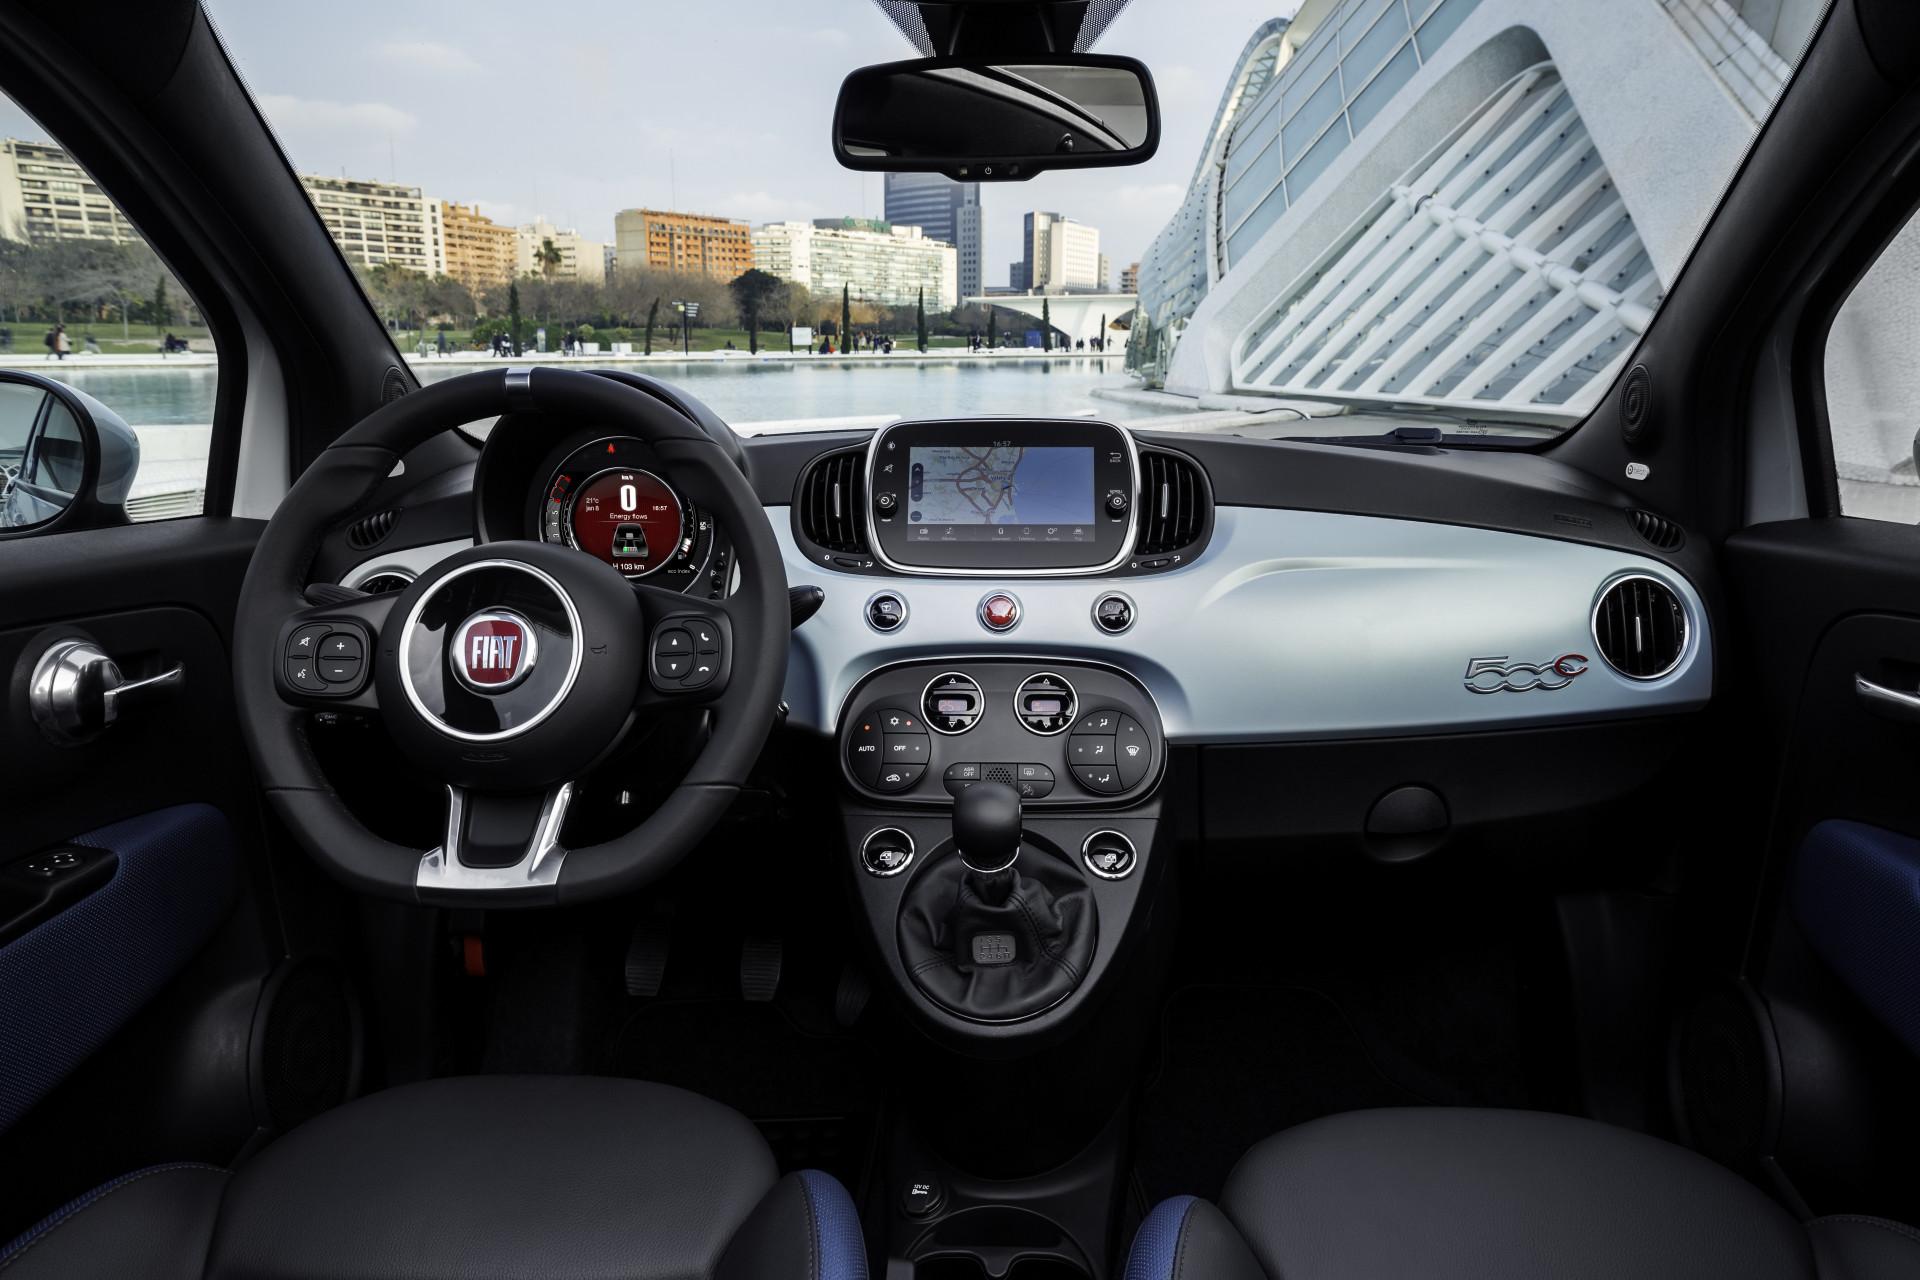 Test / Fiat 500 Hybrid / AutoGids